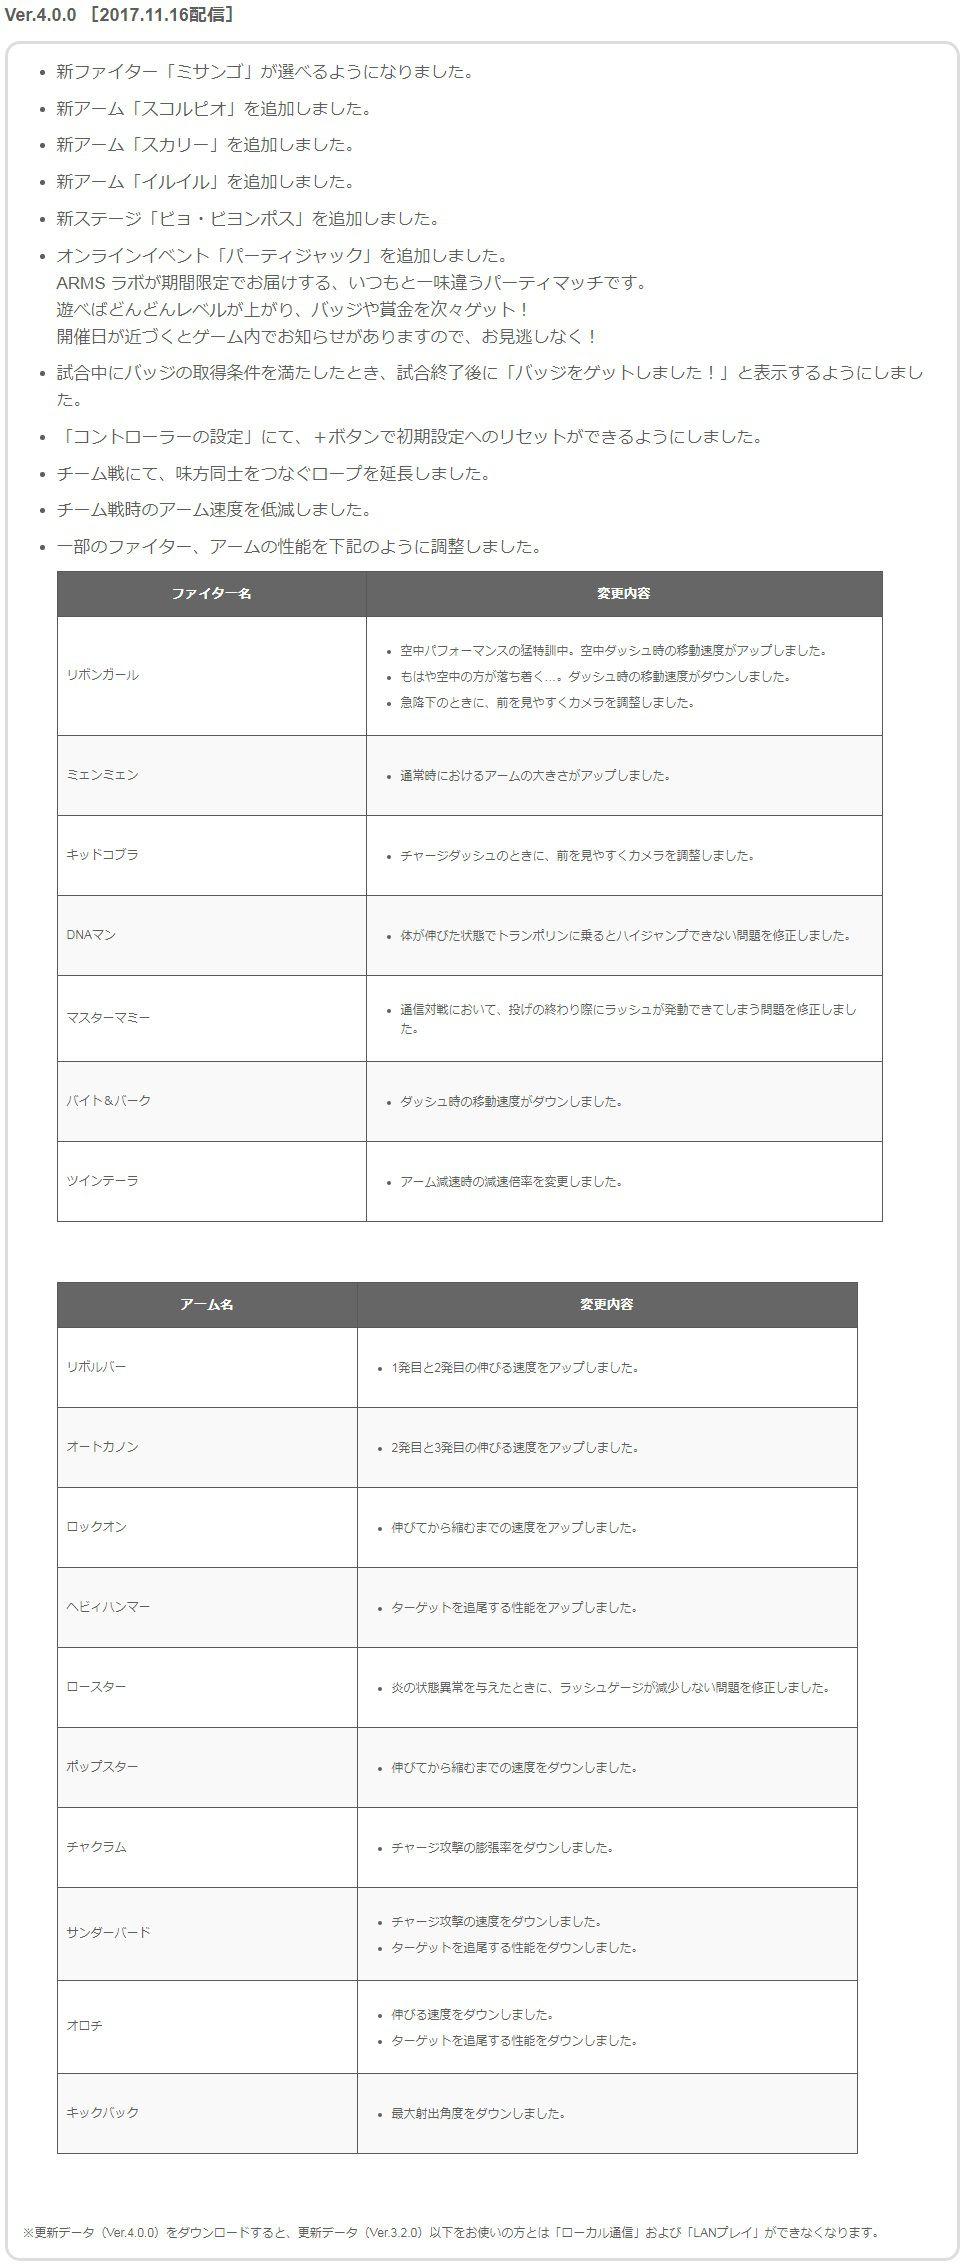 image_10727.jpg